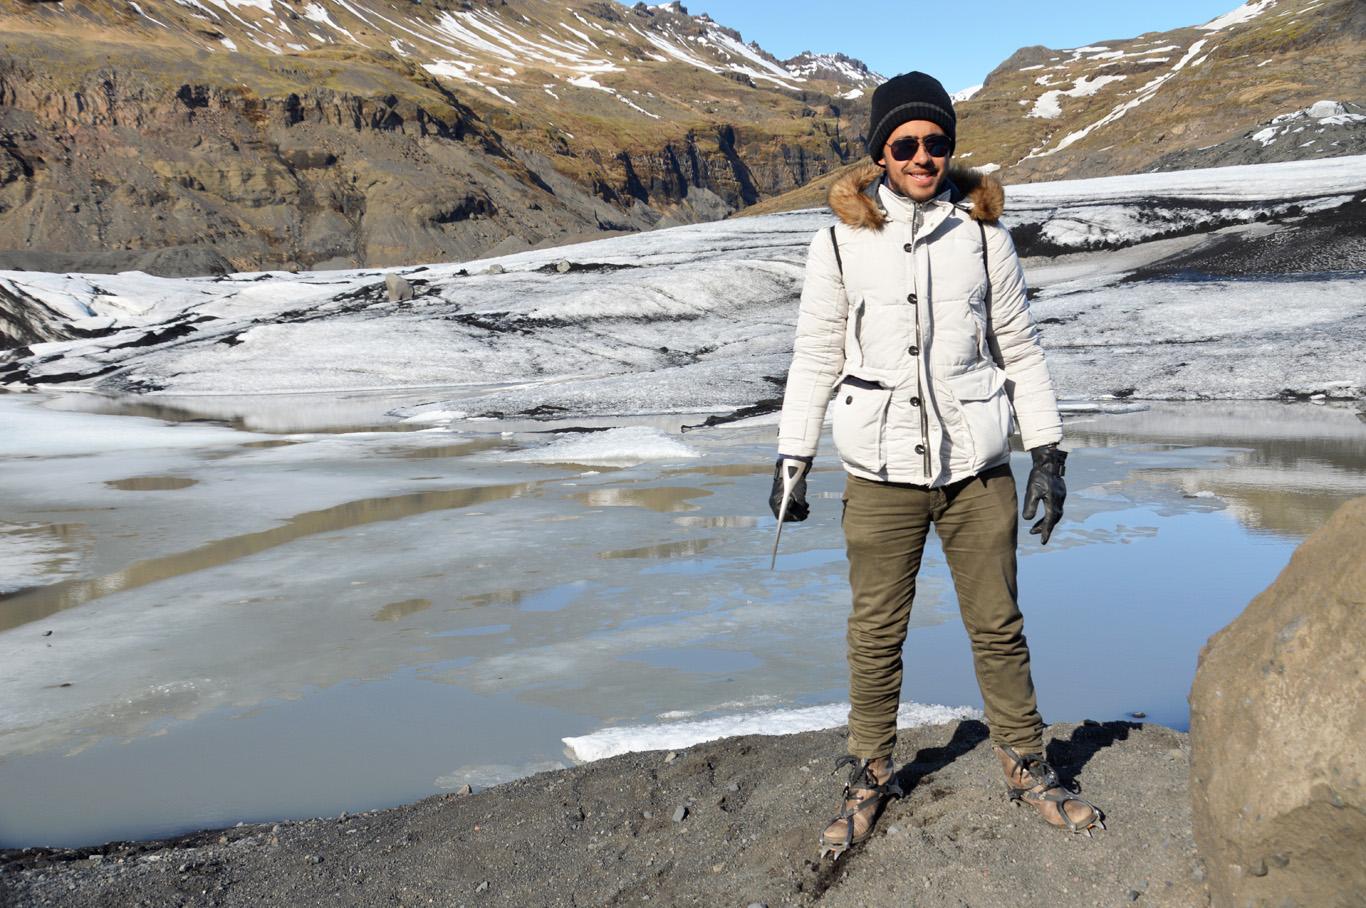 Sólheimajokull glacier - before the hike